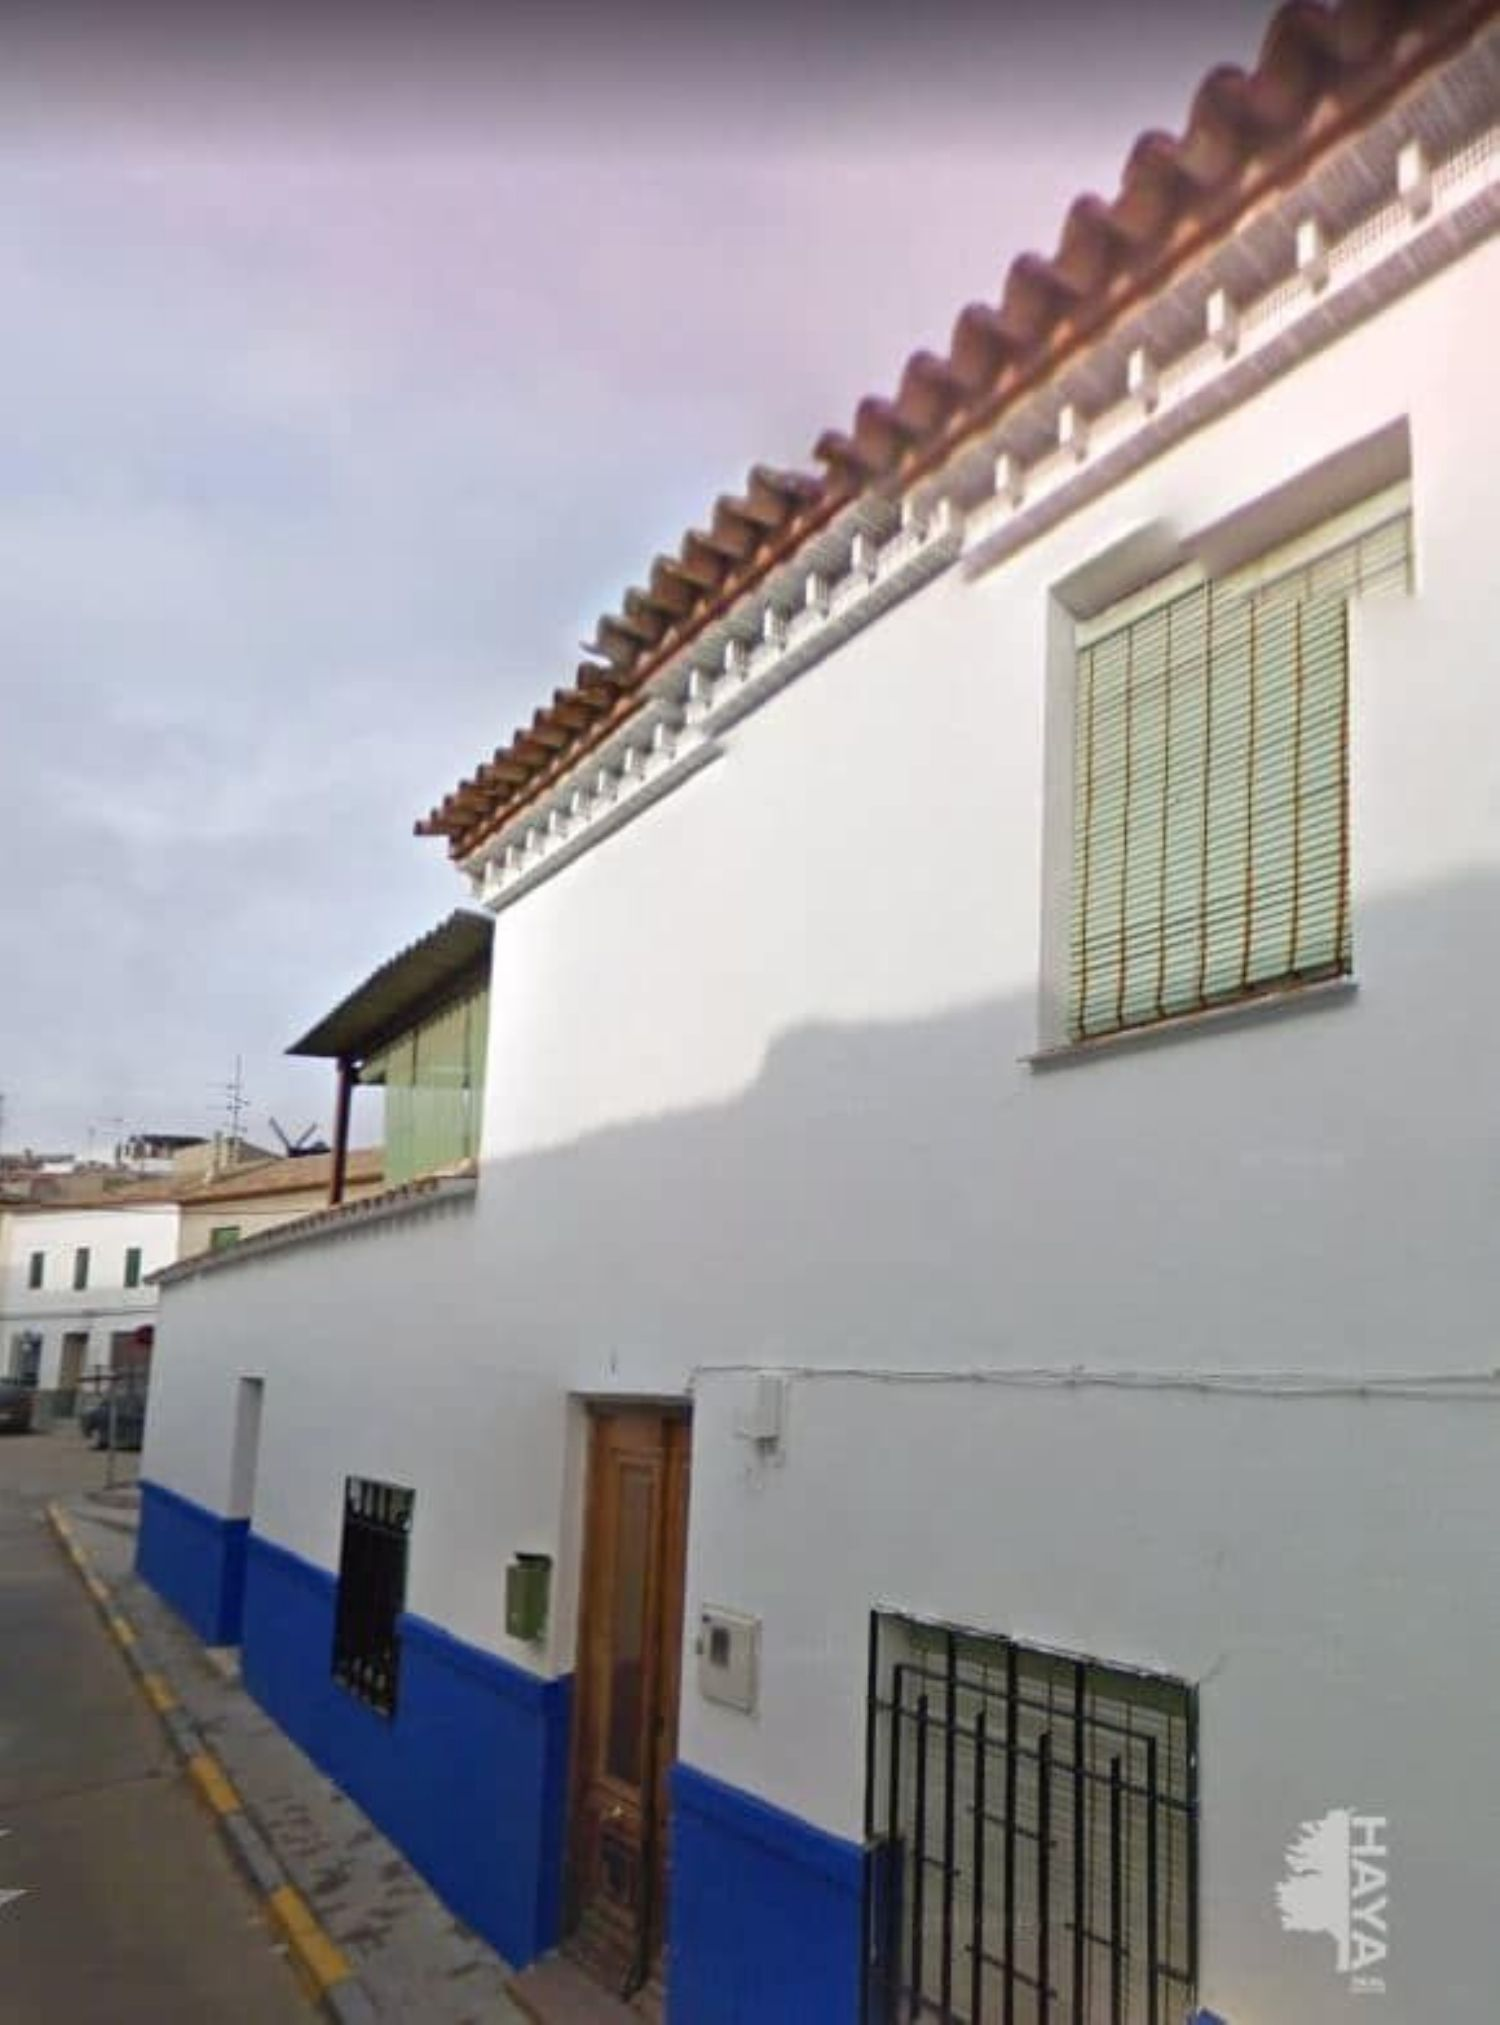 https://img3.idealista.com/blur/HOME_WI_1500/0/id.pro.es.image.master/5b/41/81/254174577.jpg